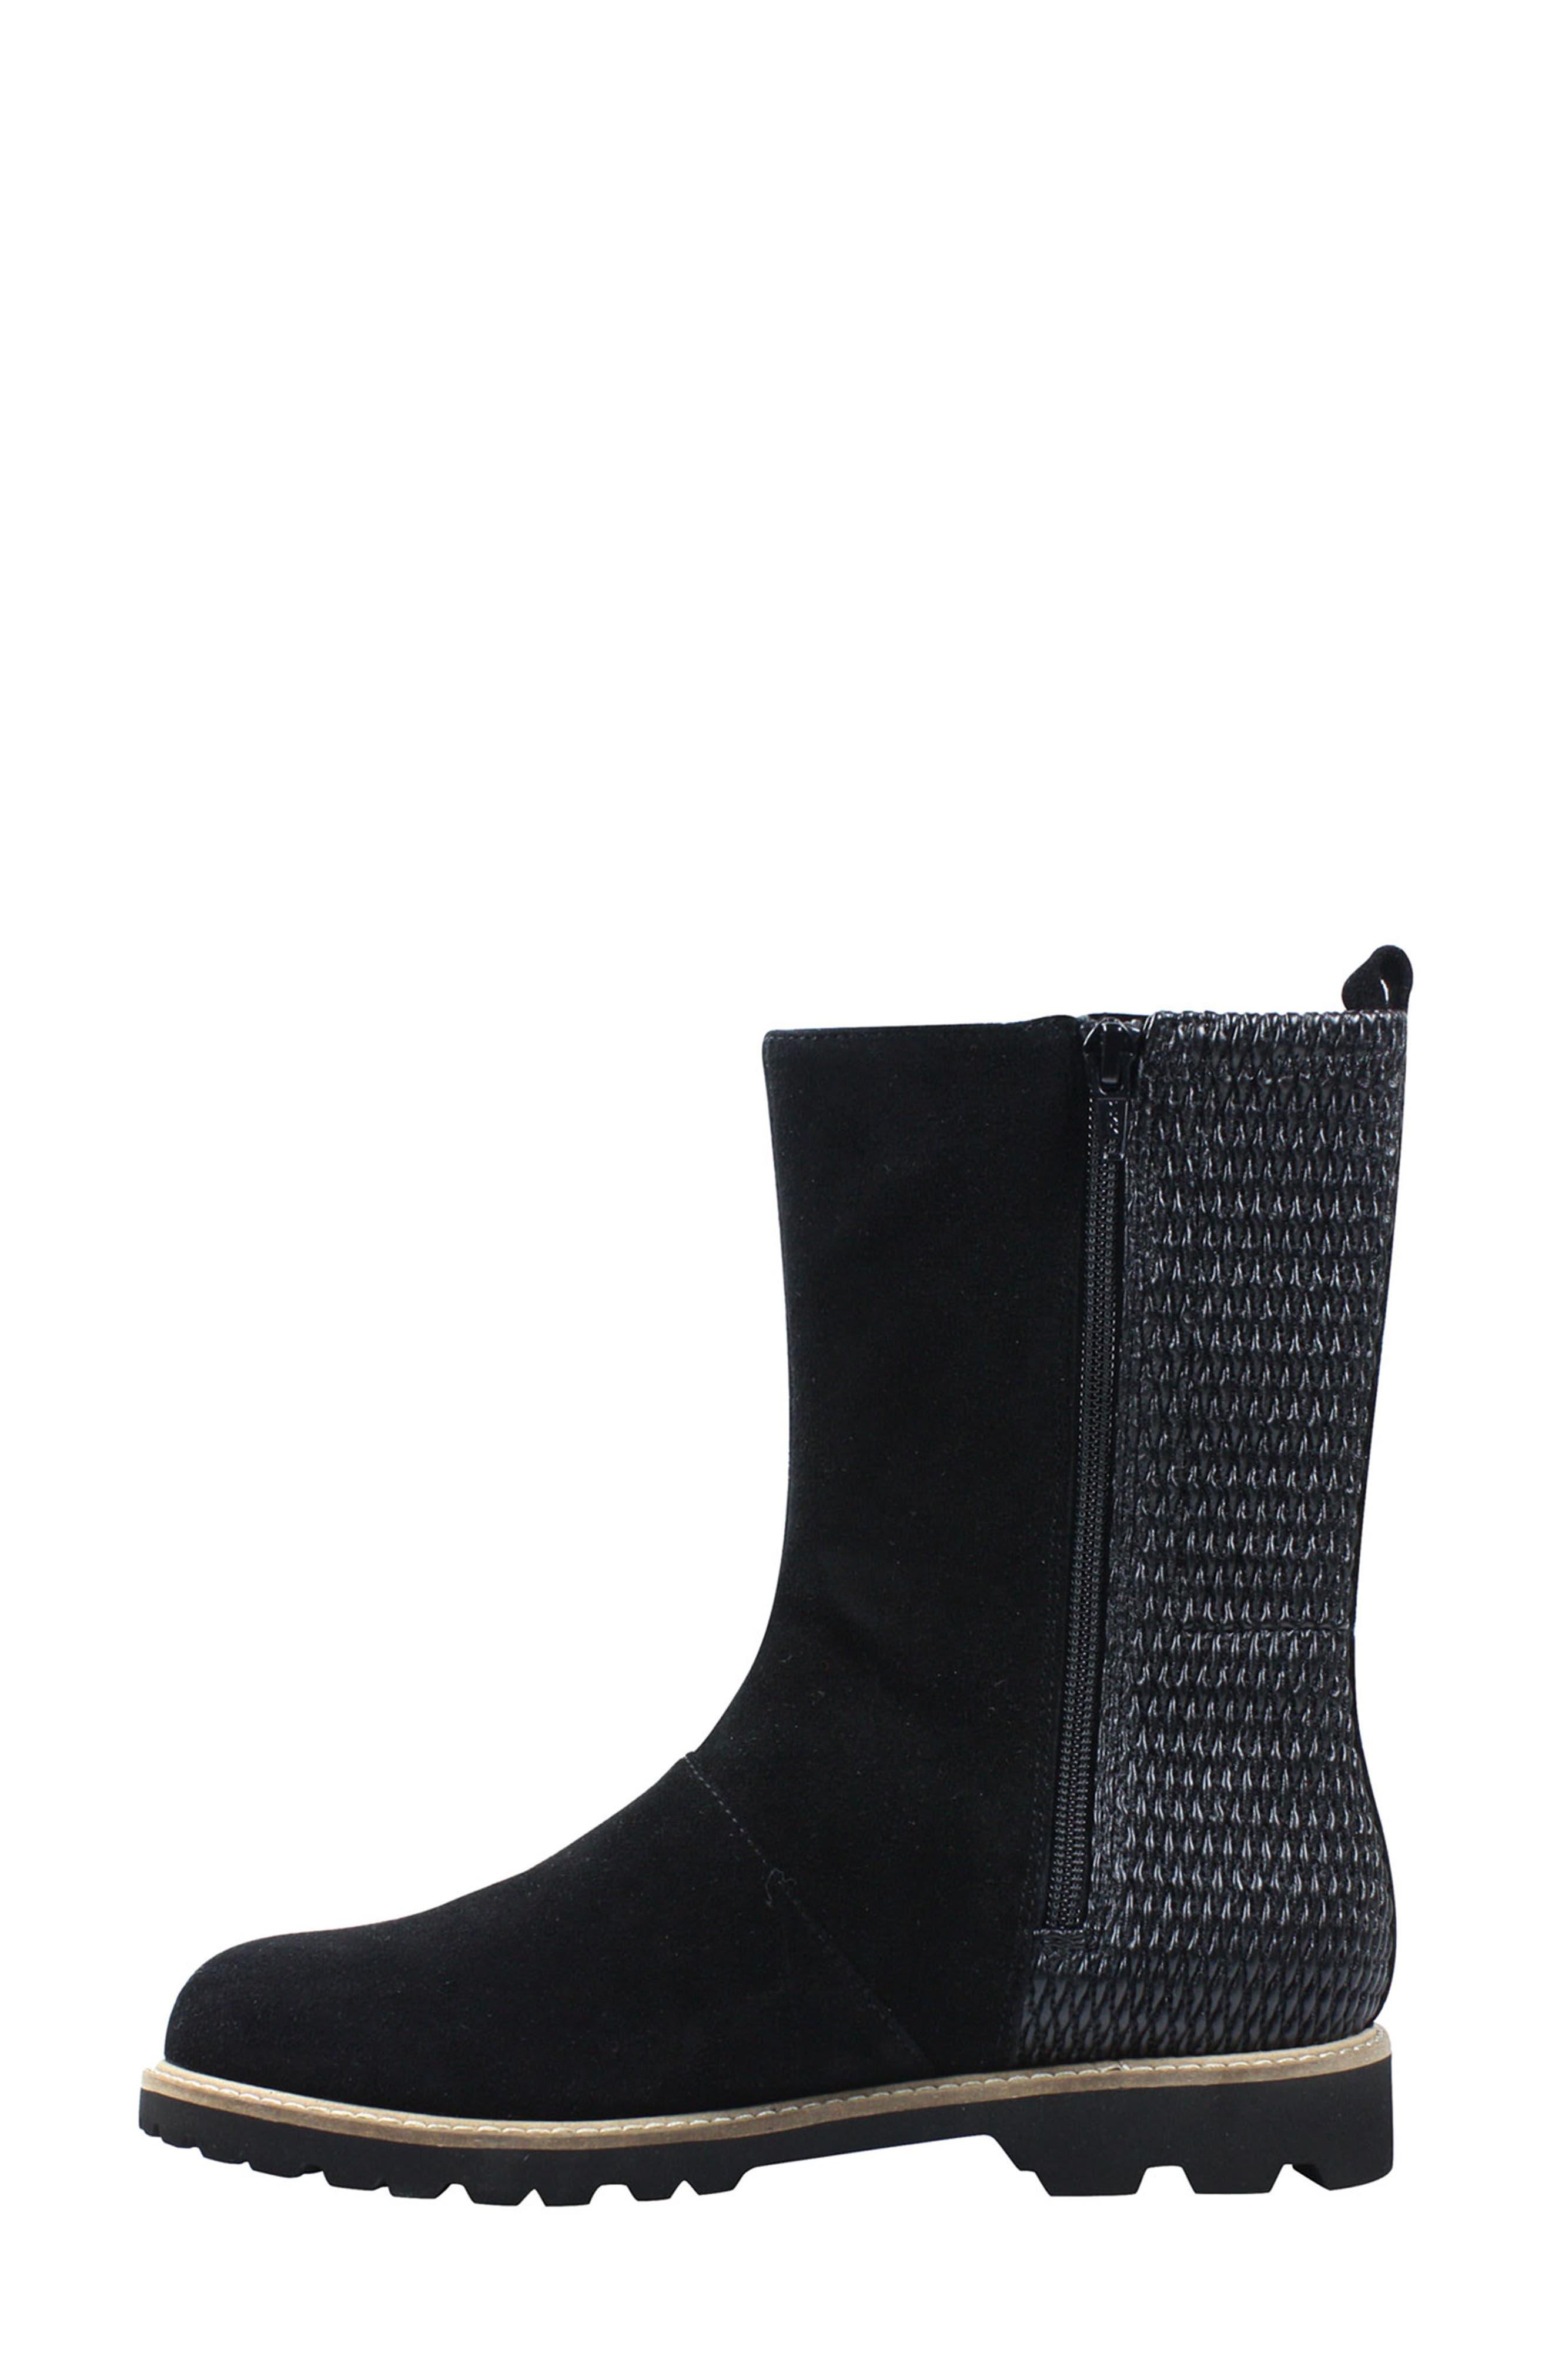 Alternate Image 2  - L'Amour des Pieds Reyney Boot (Women)